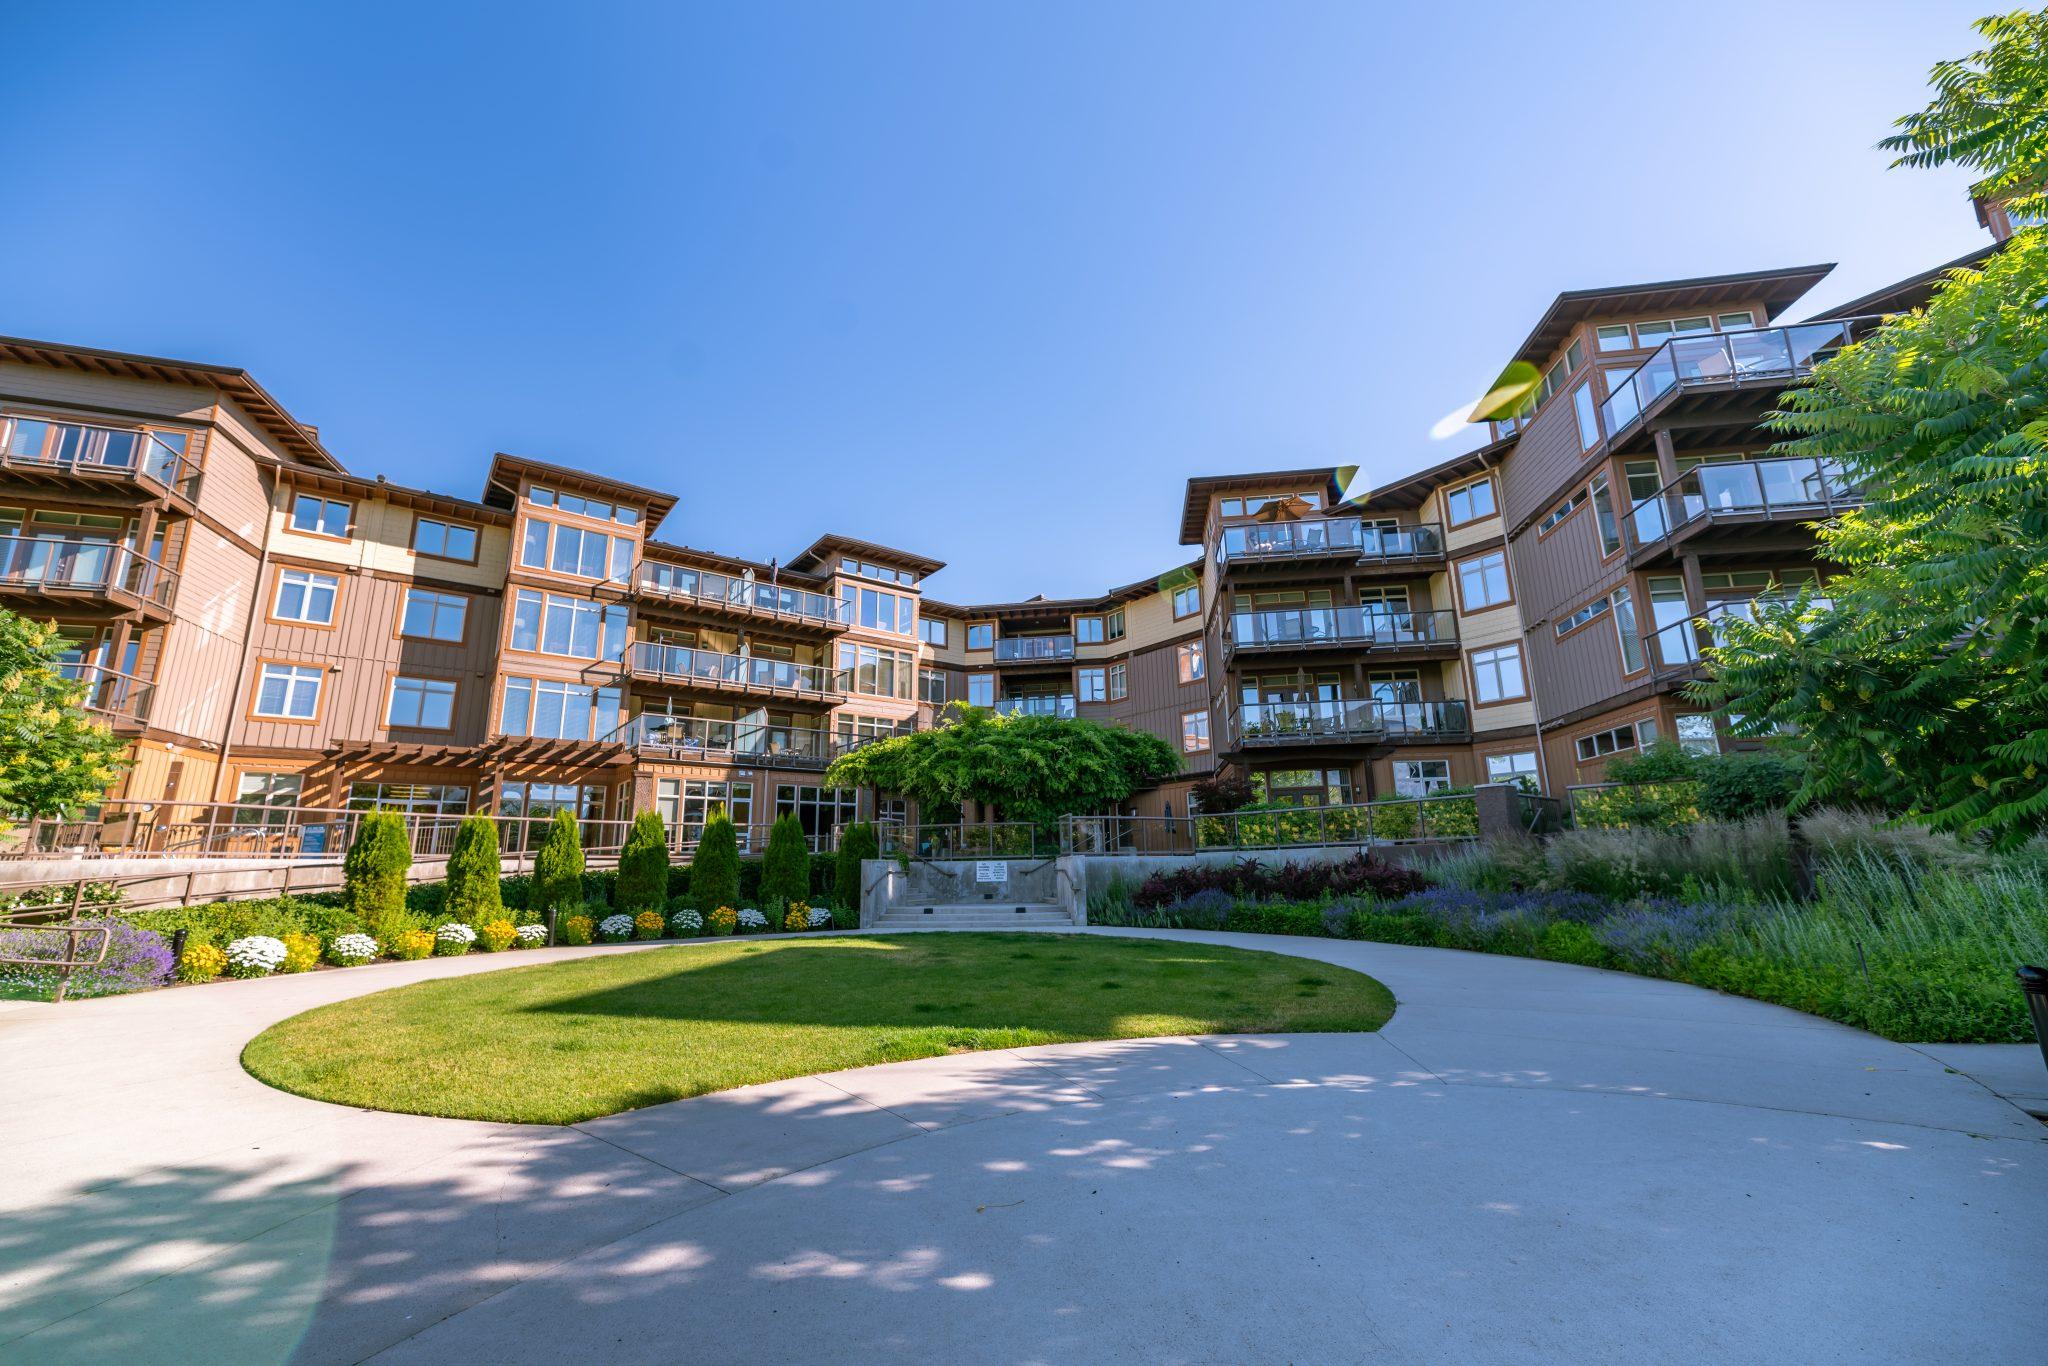 The-Cove-Lakeside-Resort-1